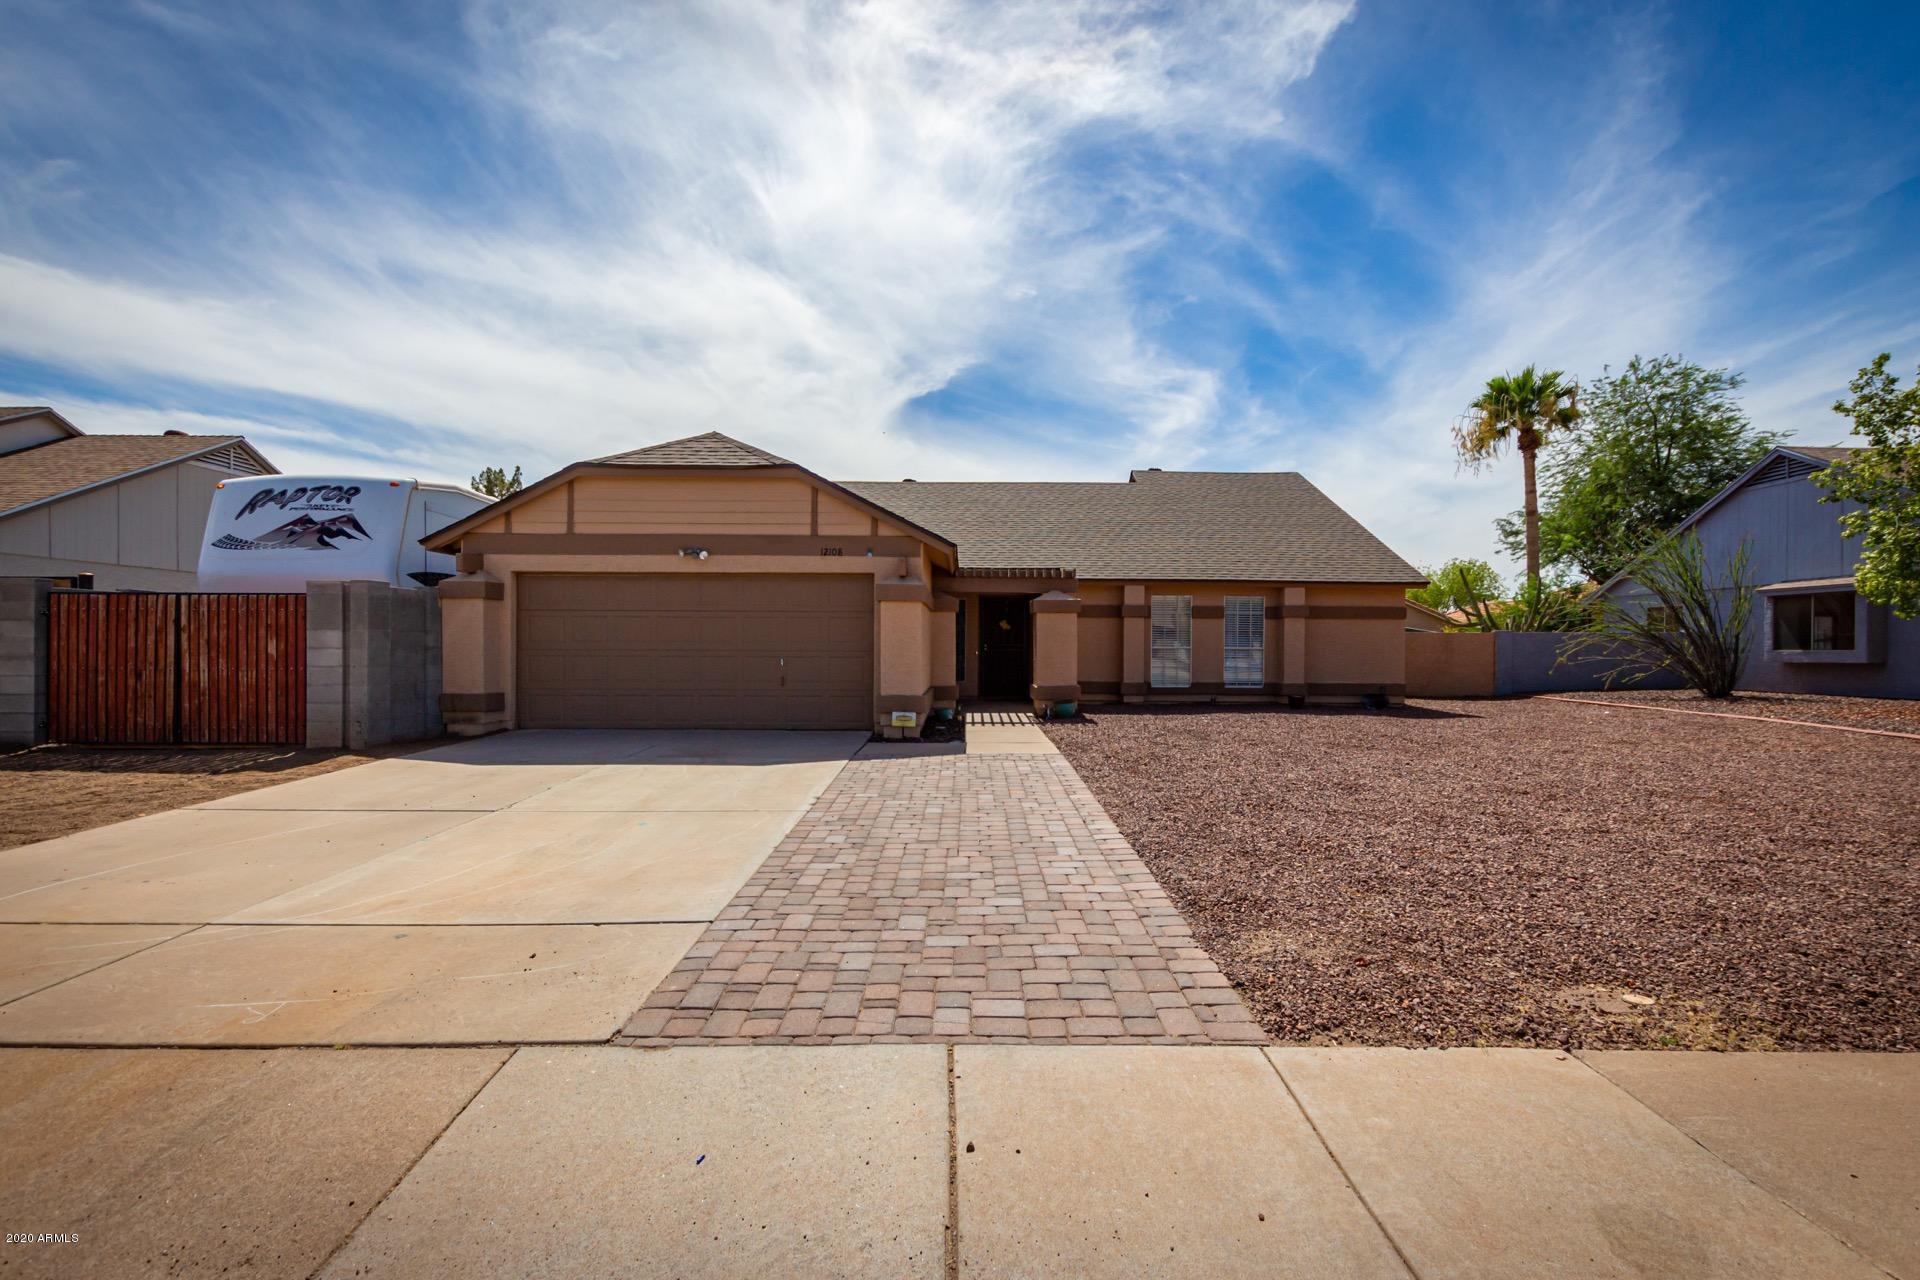 Photo of 12108 N 79TH Avenue, Peoria, AZ 85345